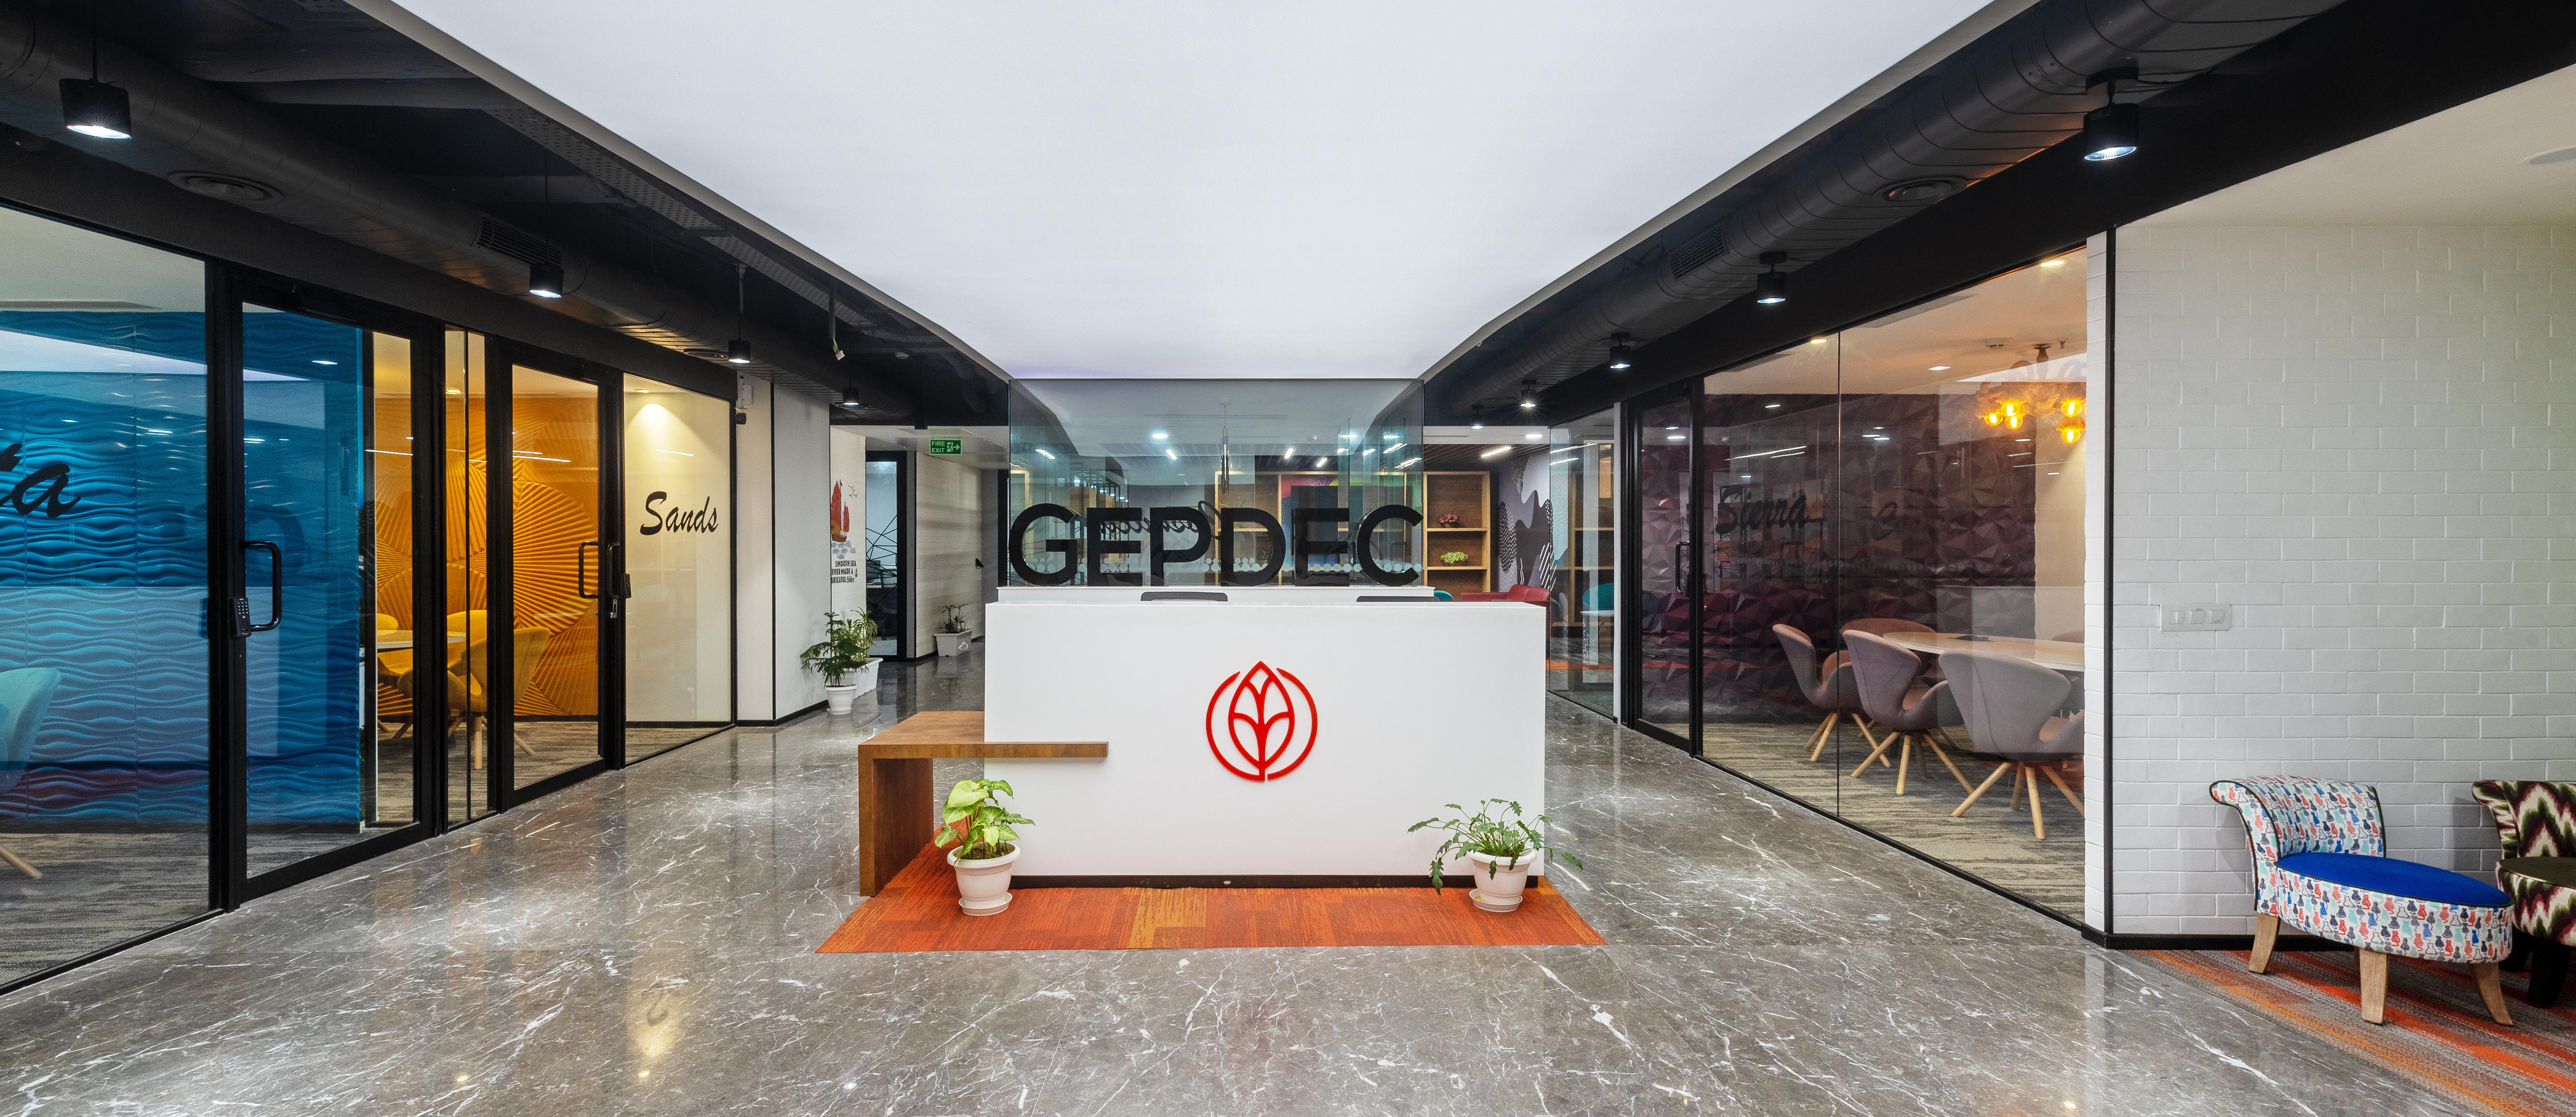 GEPDFC